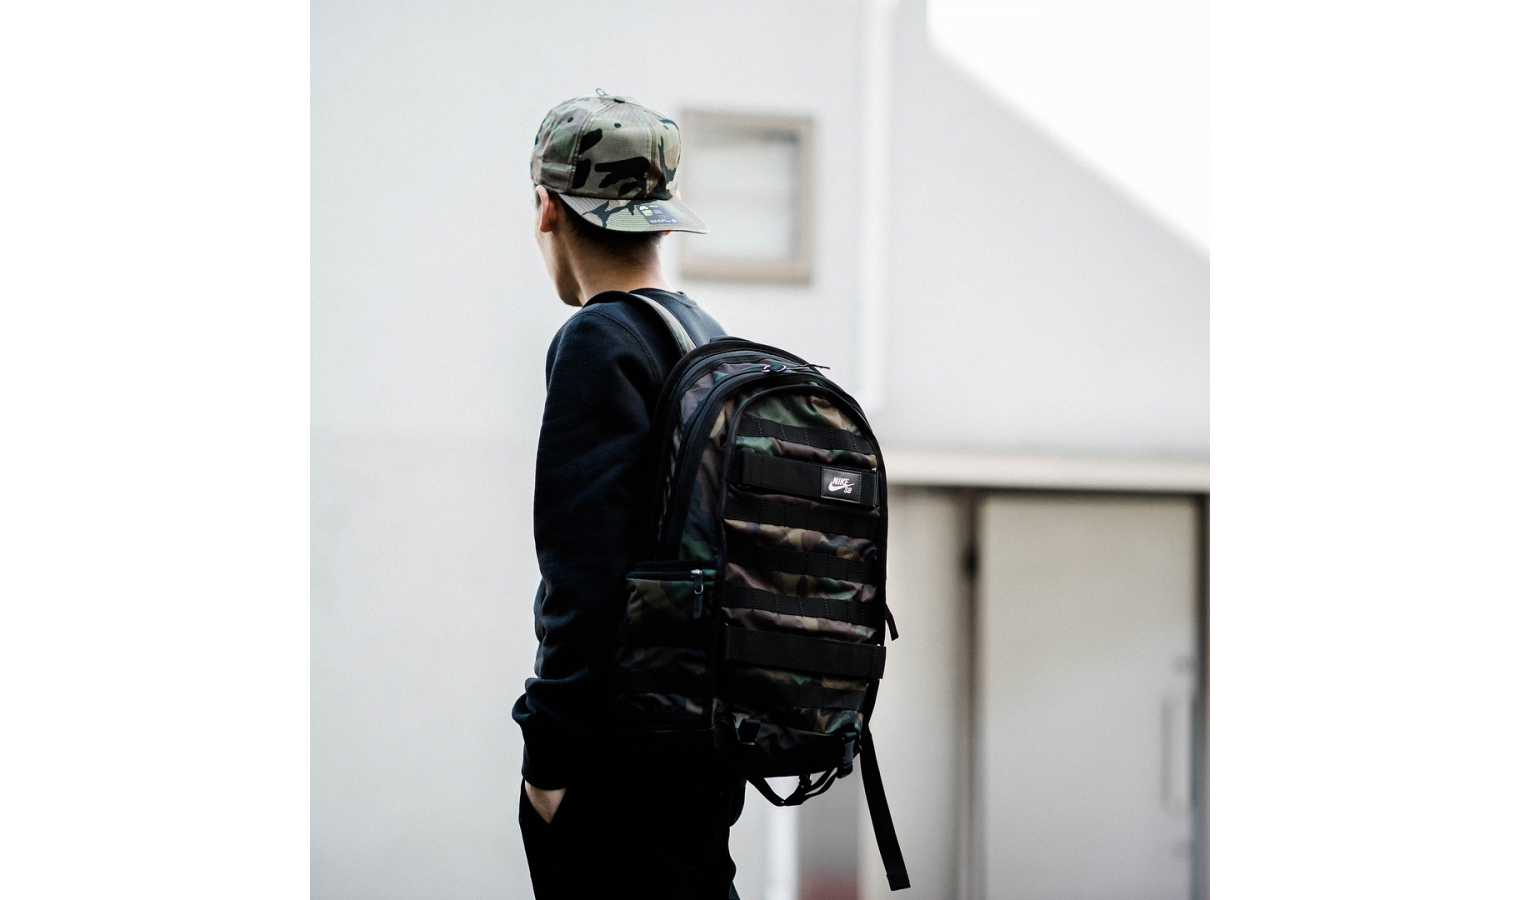 2b45516fd7 ... Pánský batoh Nike SB RPM GRAPHIC zelený. 0 Kč